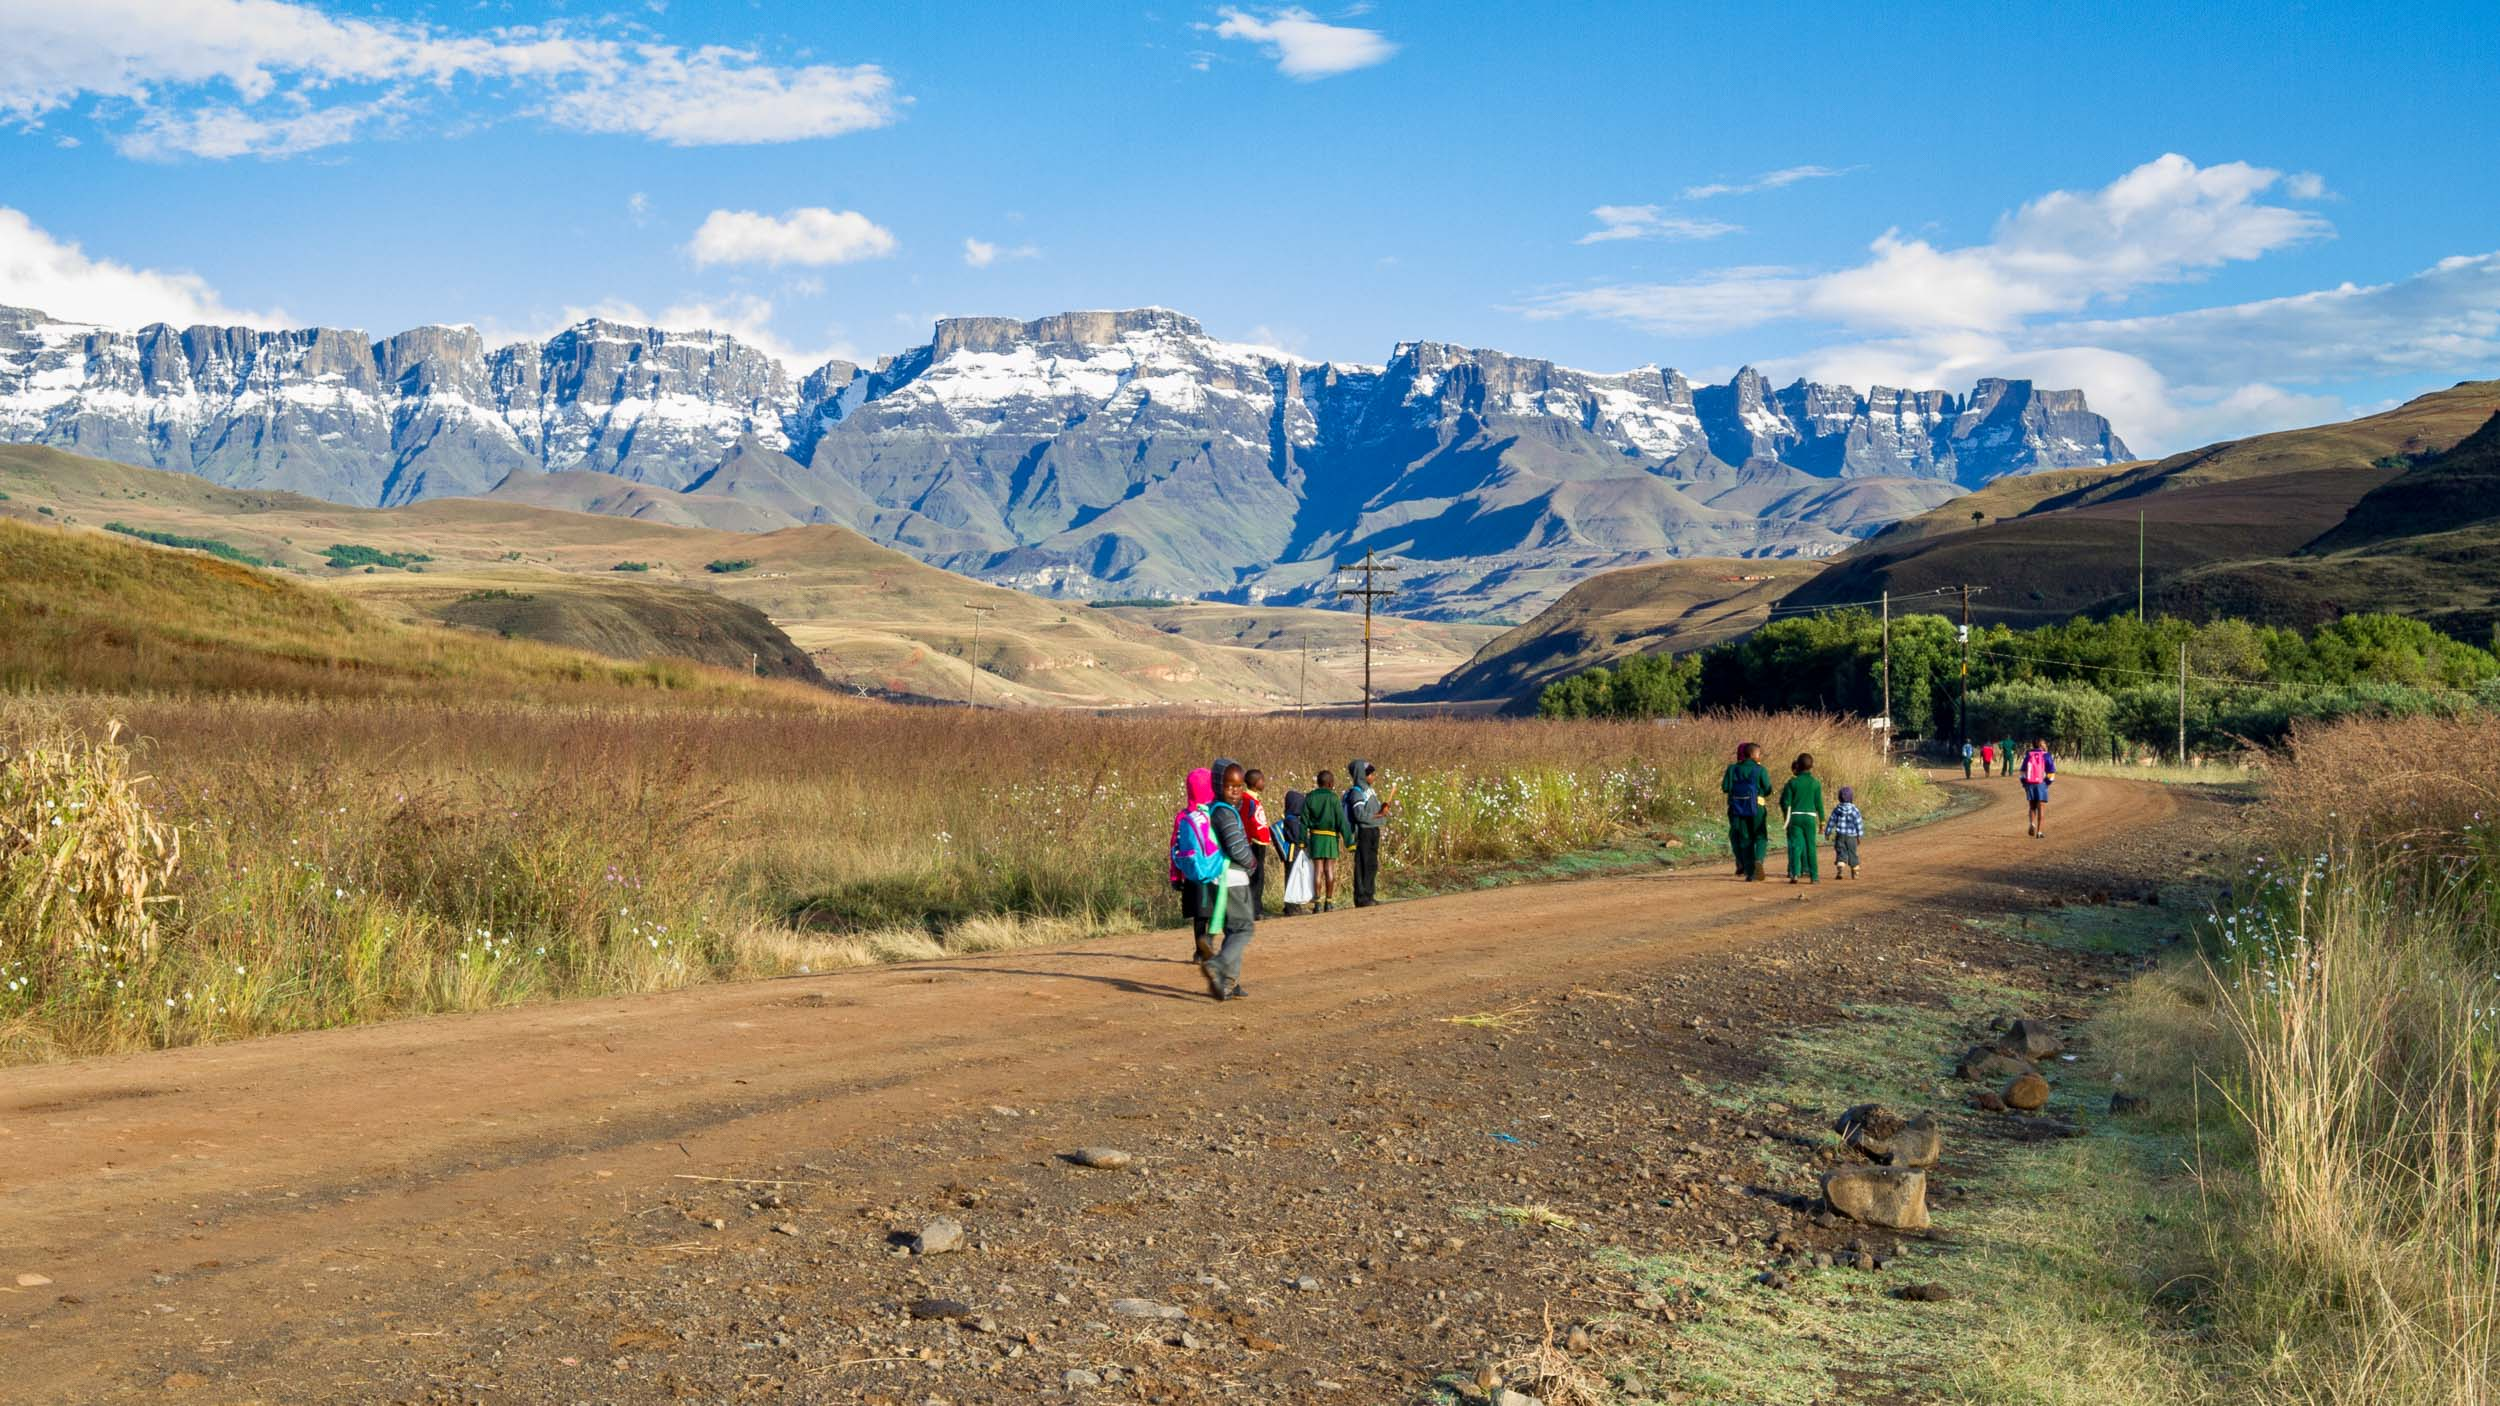 Children on their way to school – Mnweni